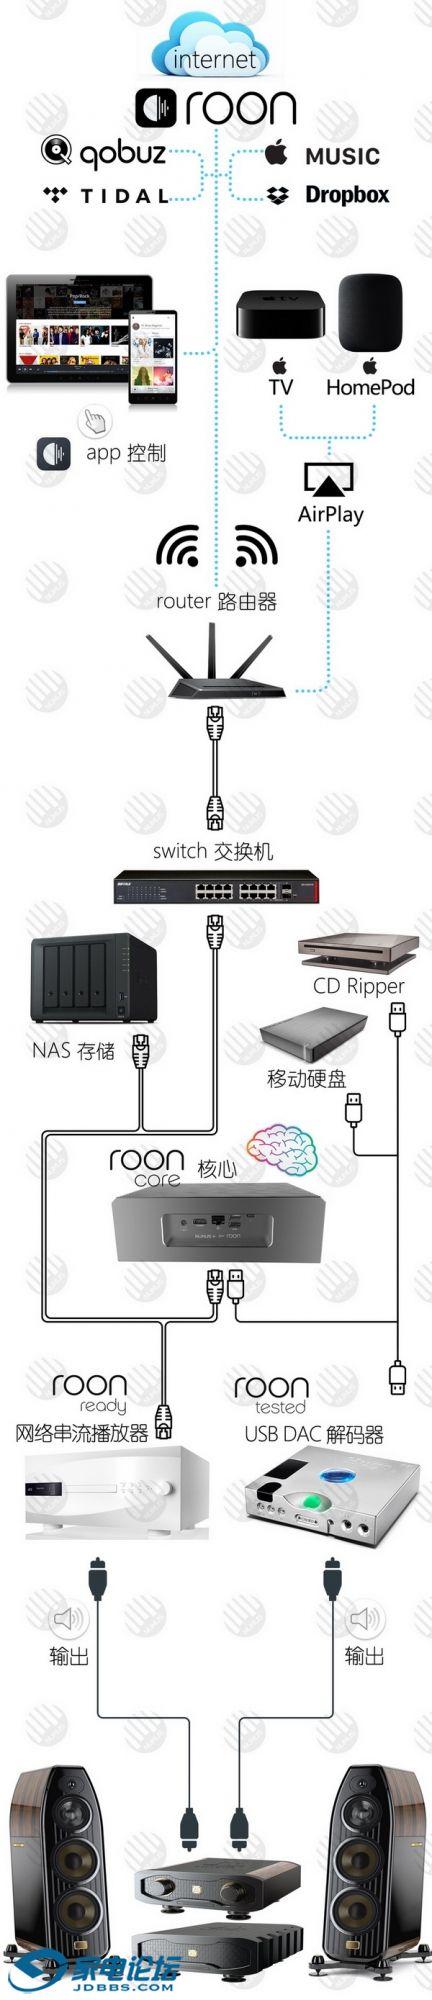 roon system1.jpg